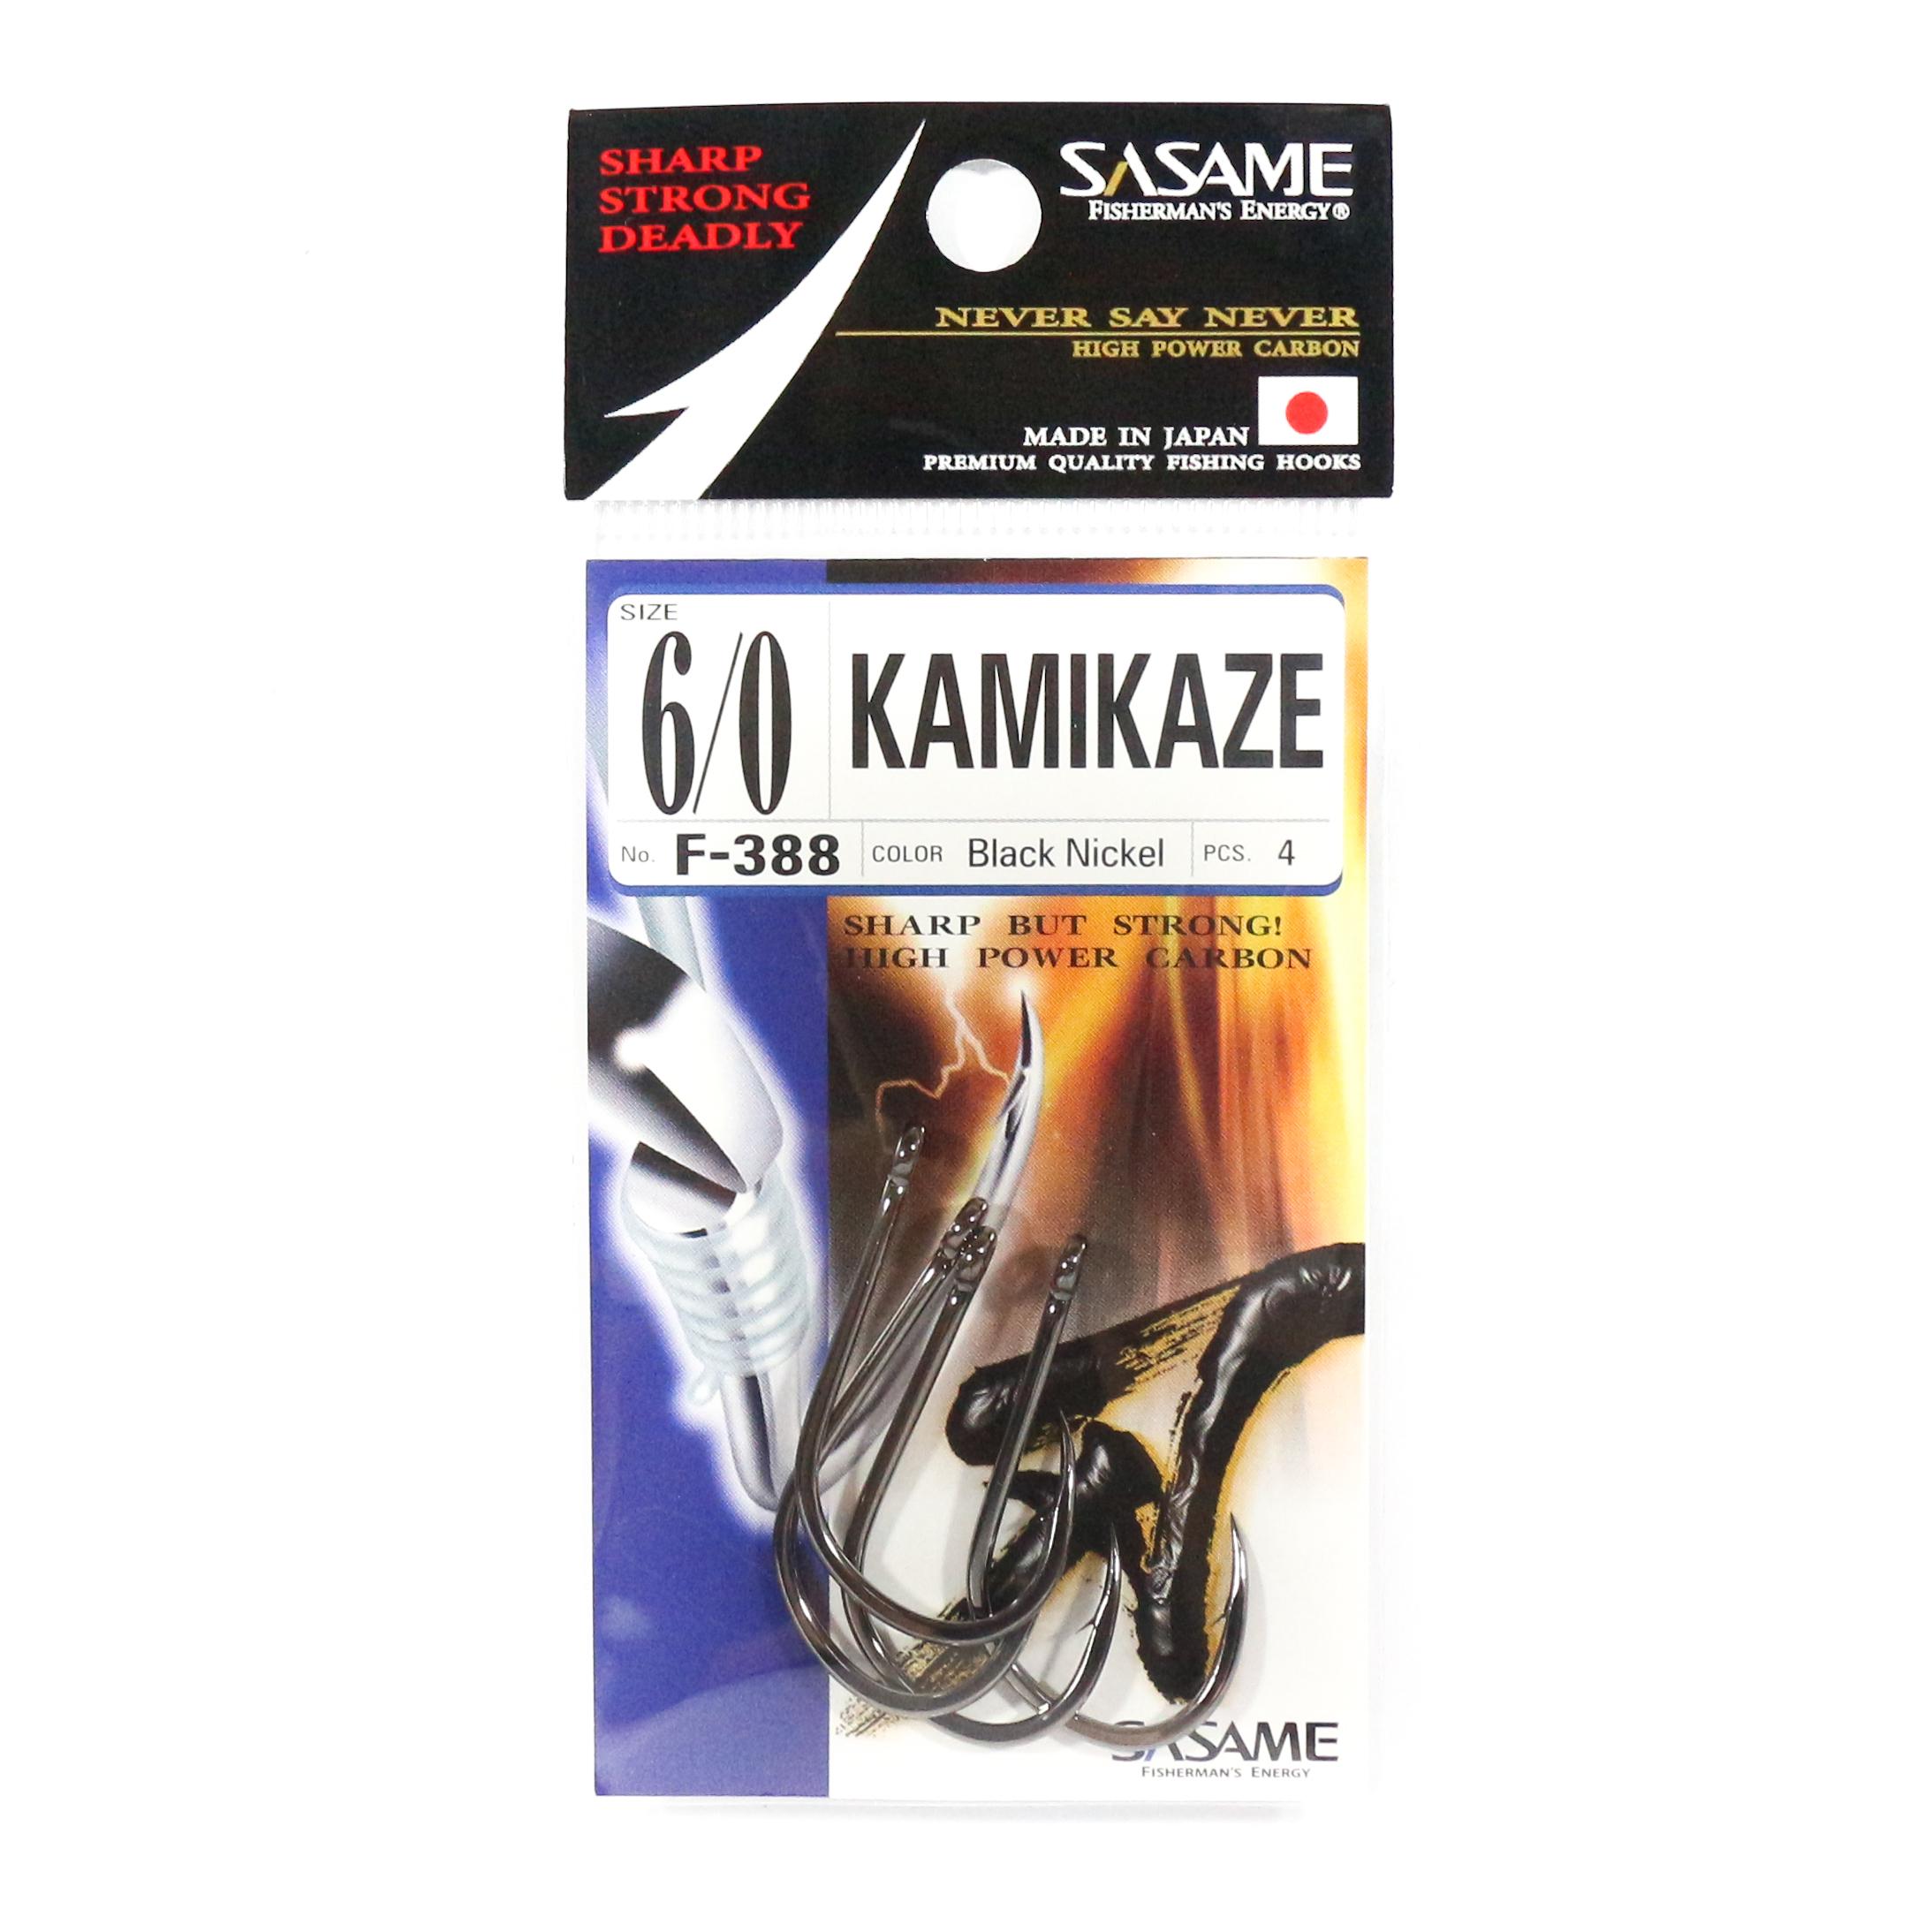 Sasame F-388 Kamikaze Straight Shank Offset Hook Size 6/0 (4828)